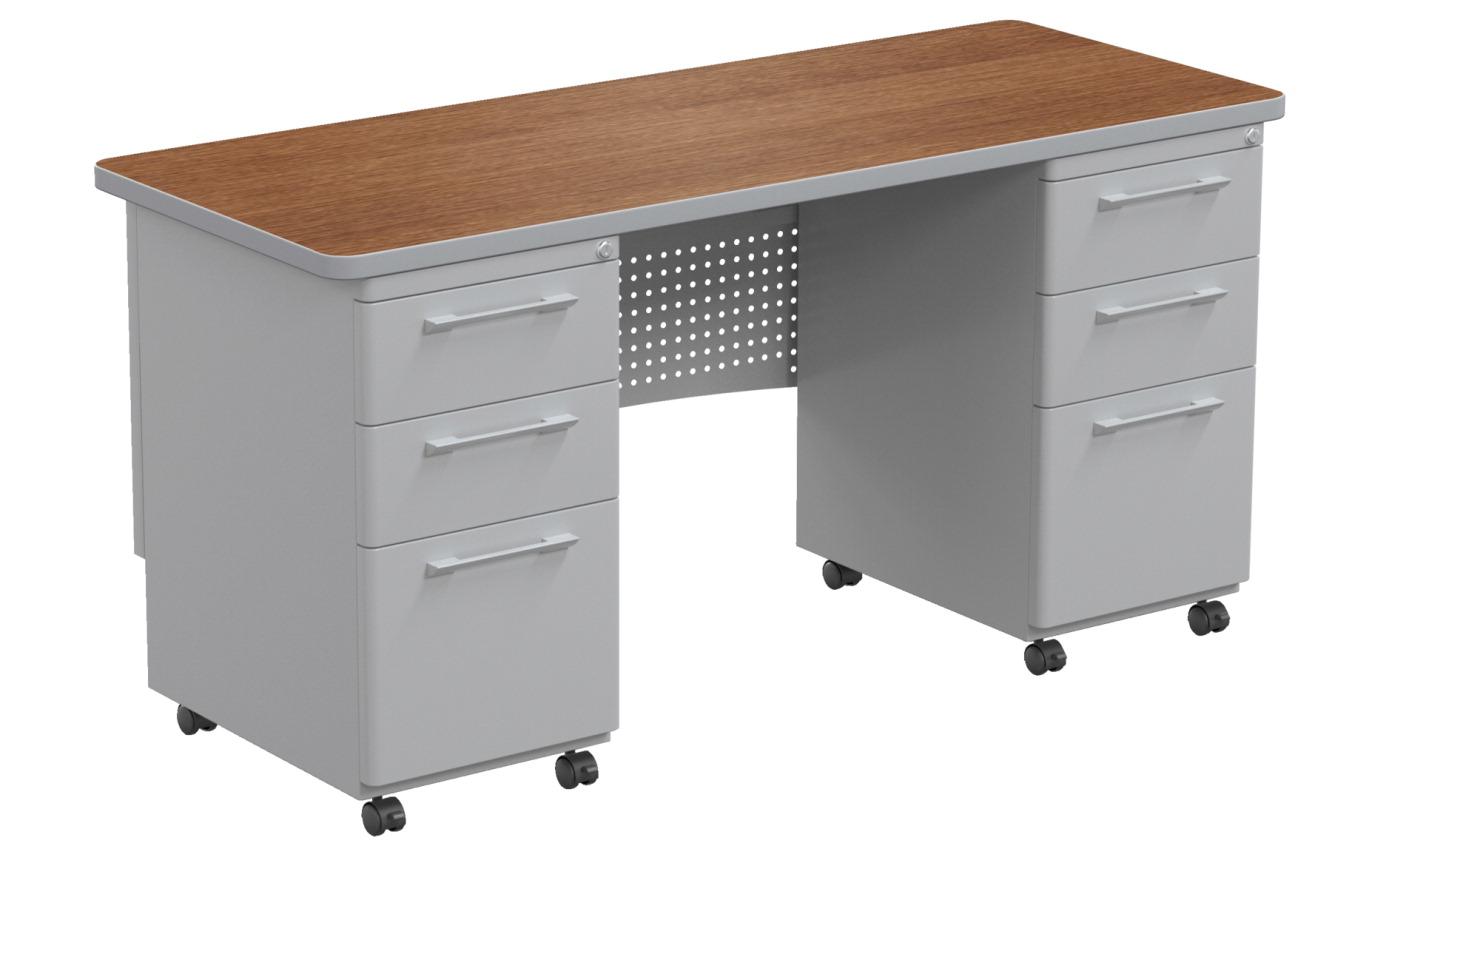 Classroom Select Double Pedestal Teachers Desk Soar Life Products